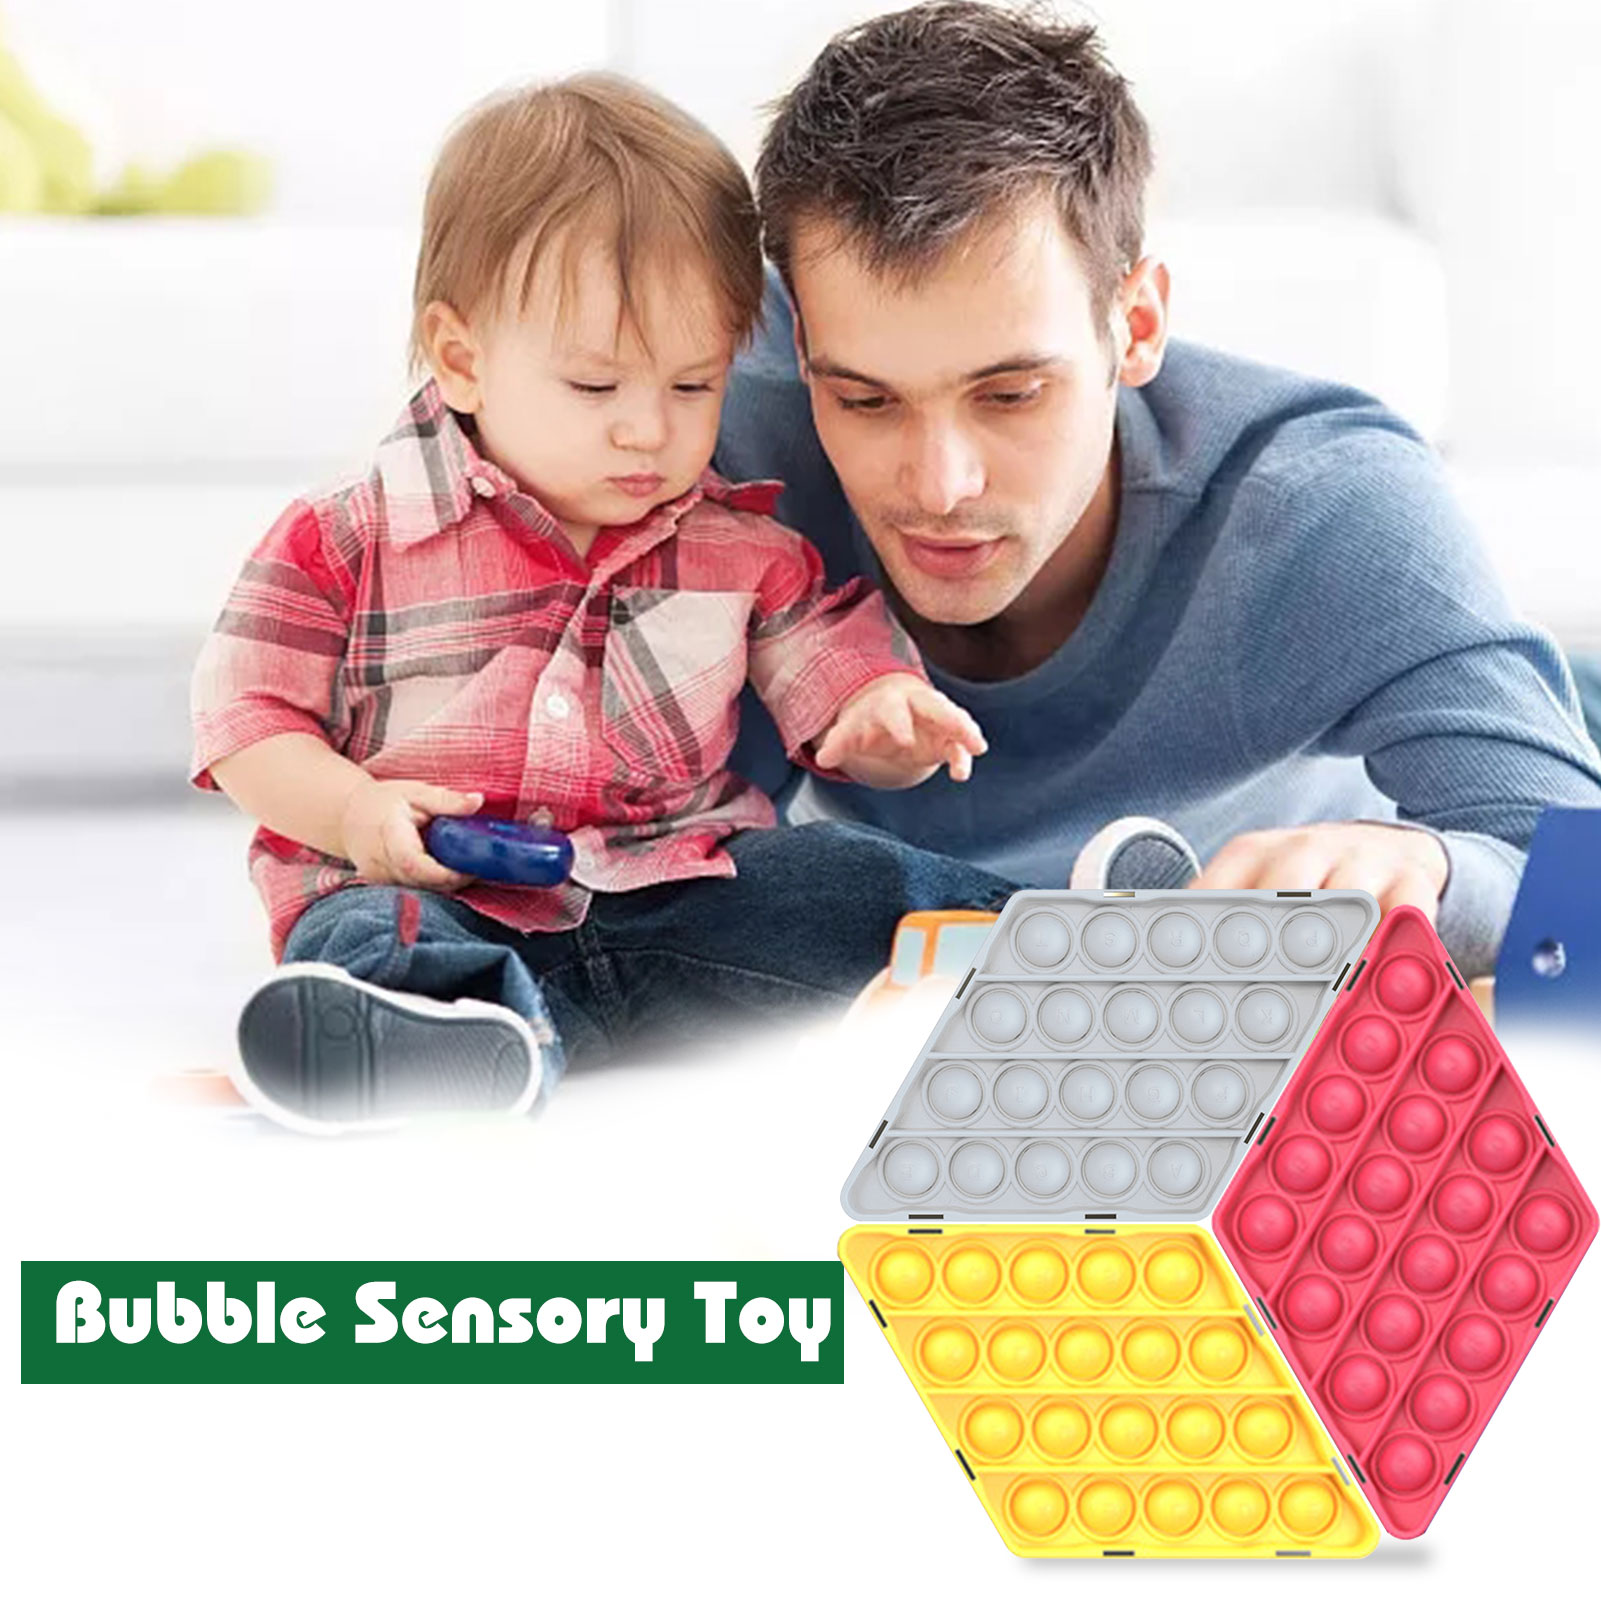 DIY Magnet Push Pop Bubble Sensory Toy for Kids Adult Anti Stress Pop it Fidget Toys Autism Special Needs Stress Reliever Toys enlarge